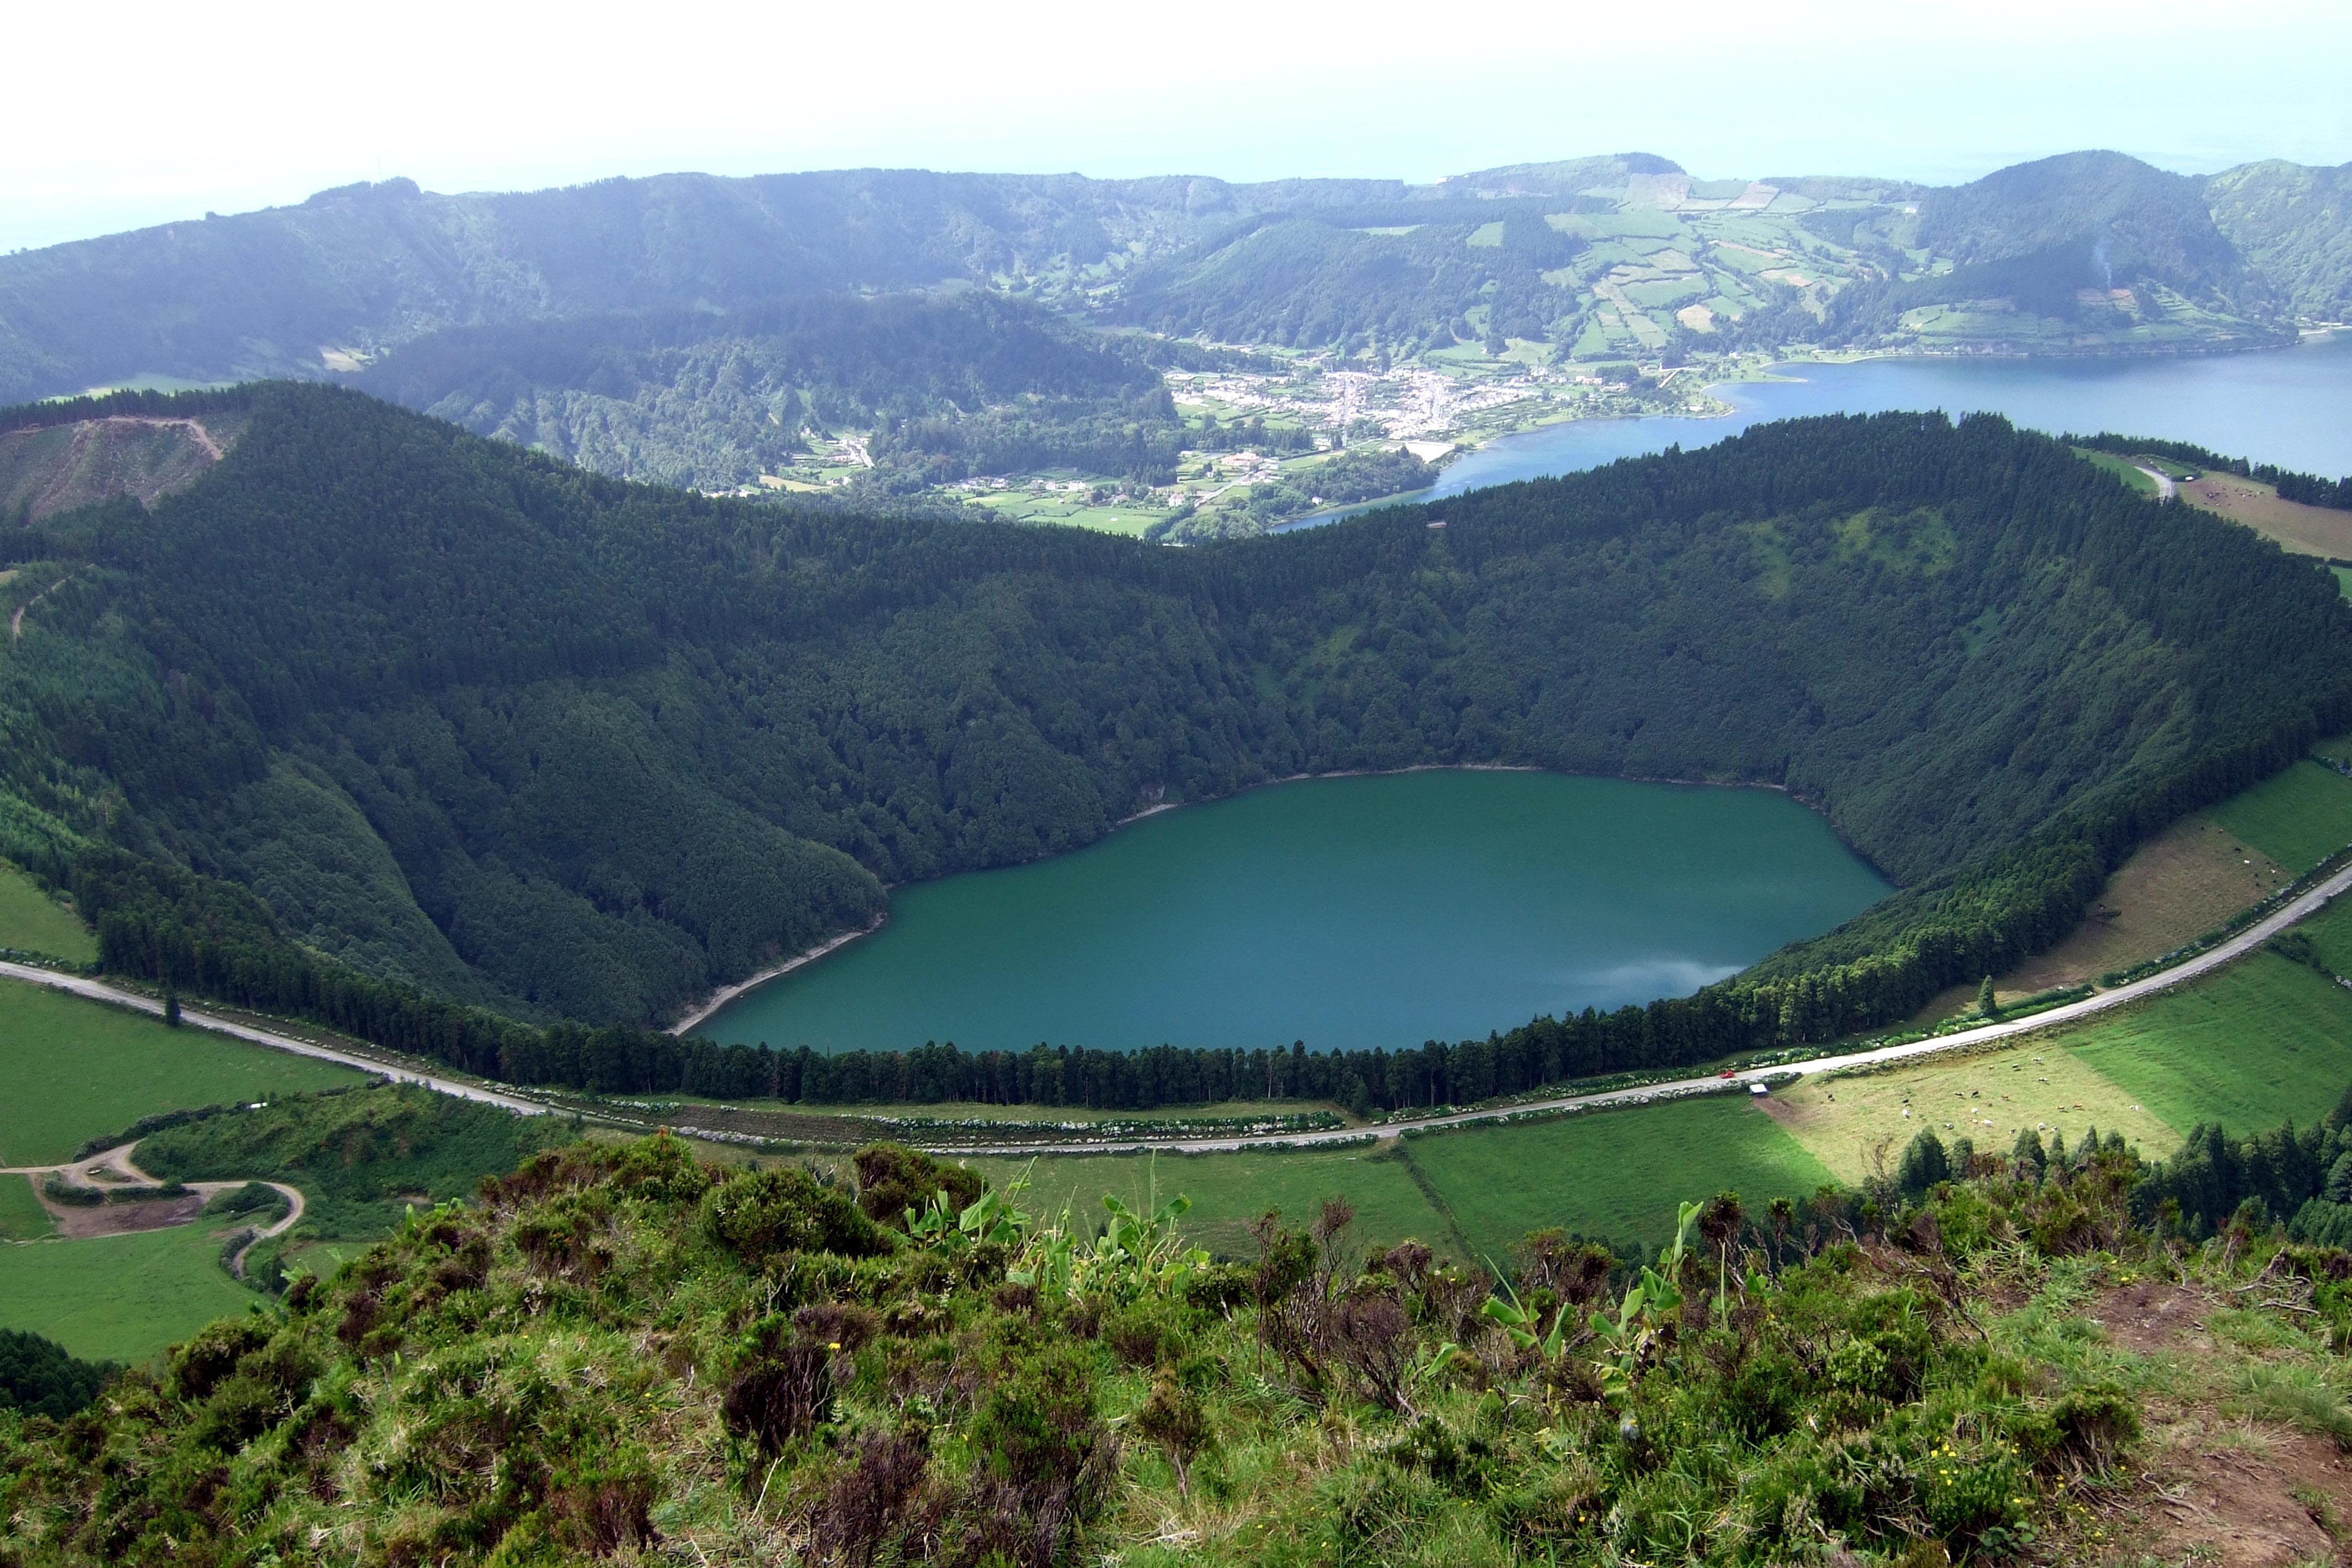 File Sao Miguel Island Azores Sete Cidades Caldera